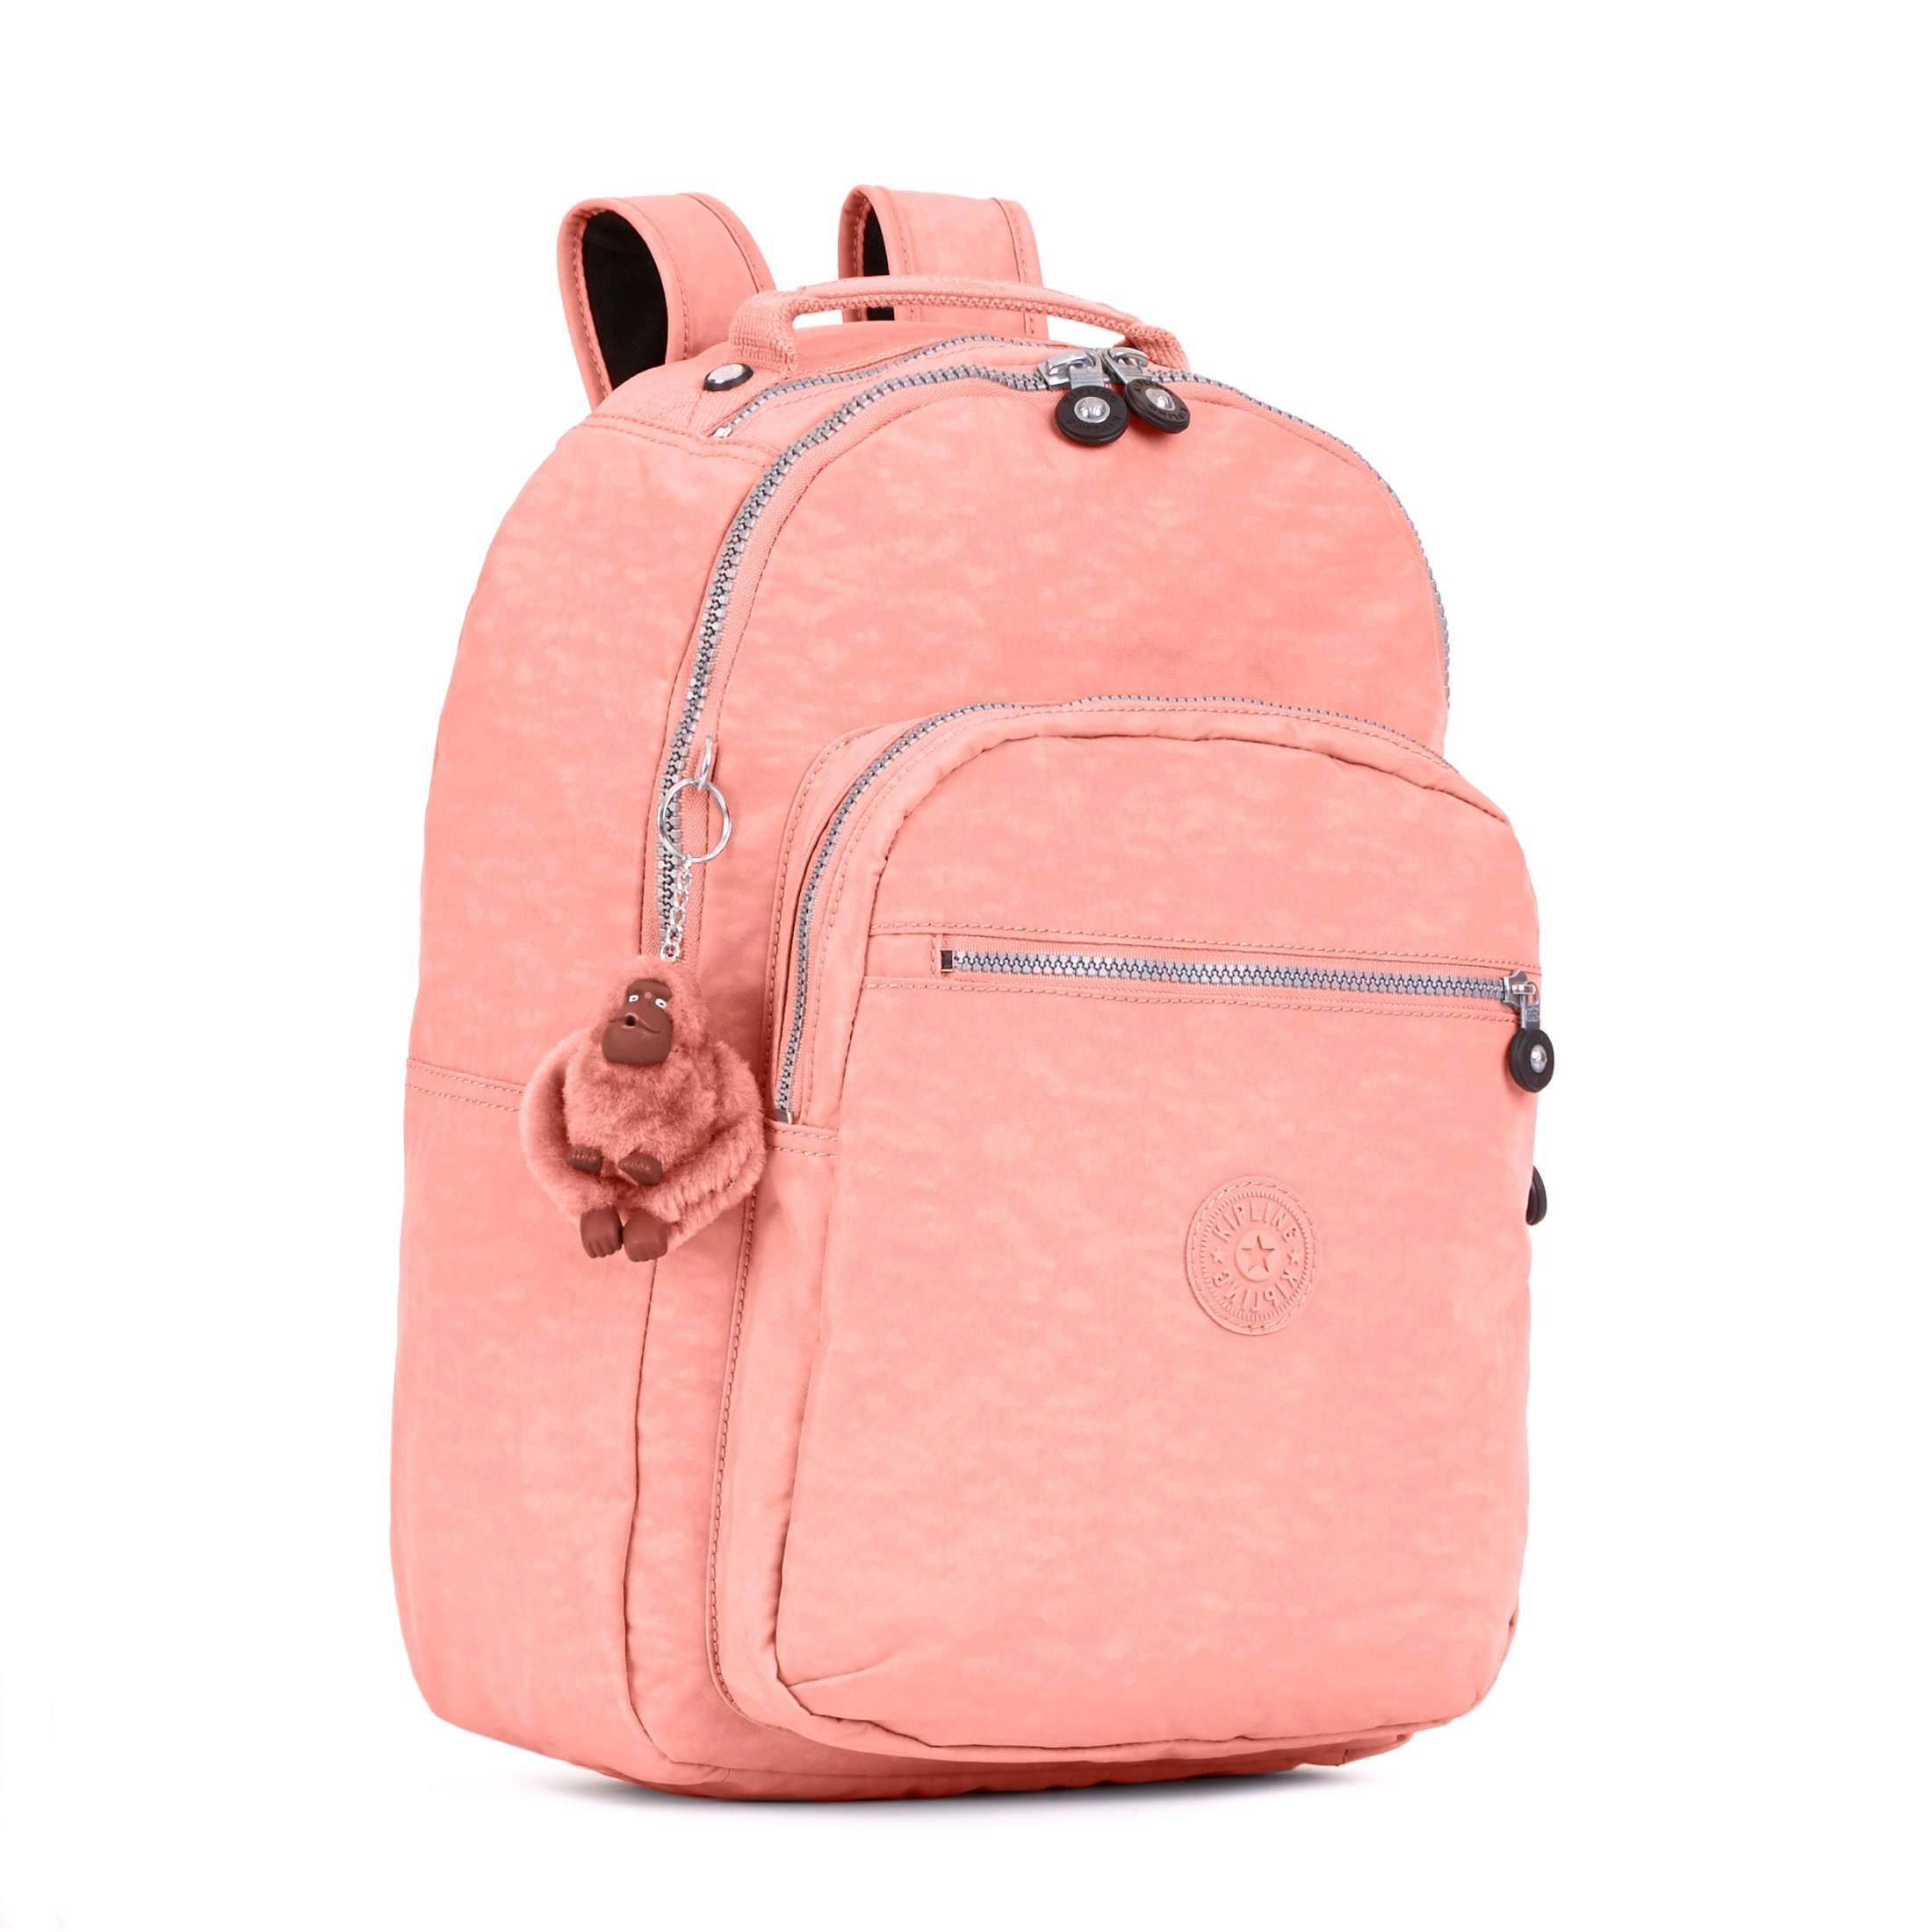 442d57d7e Seúl Mochila para portátil - Pink Sherbert | Kipling | Back-to ...